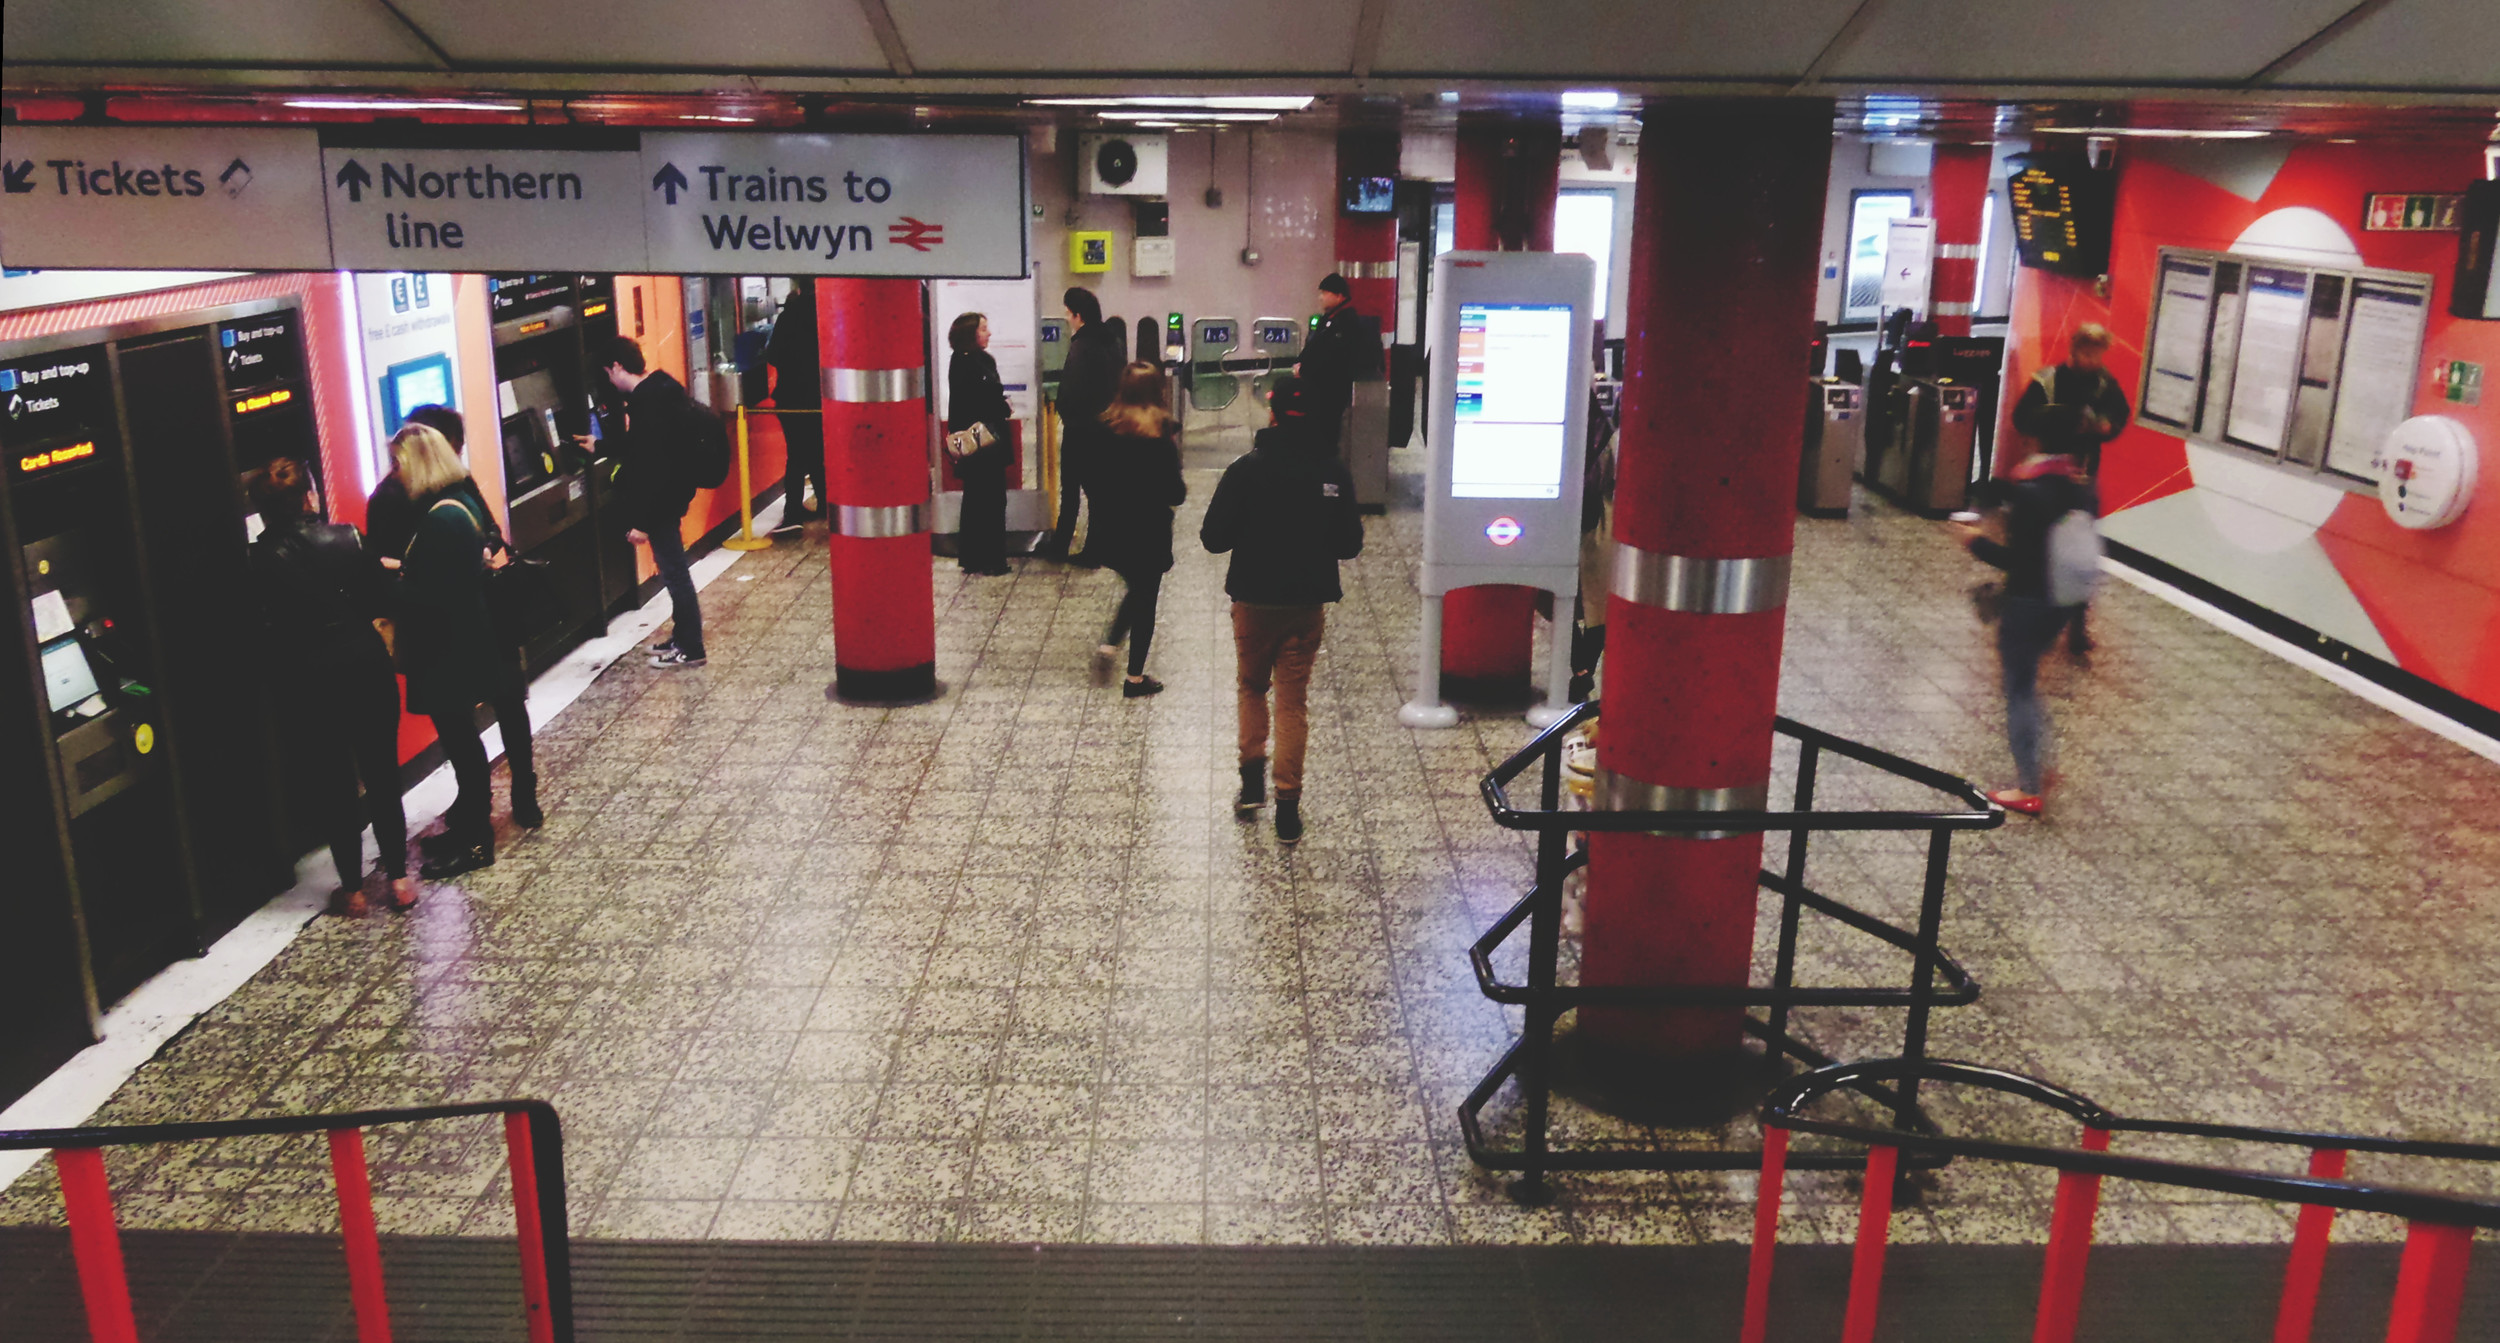 Old Street tube station